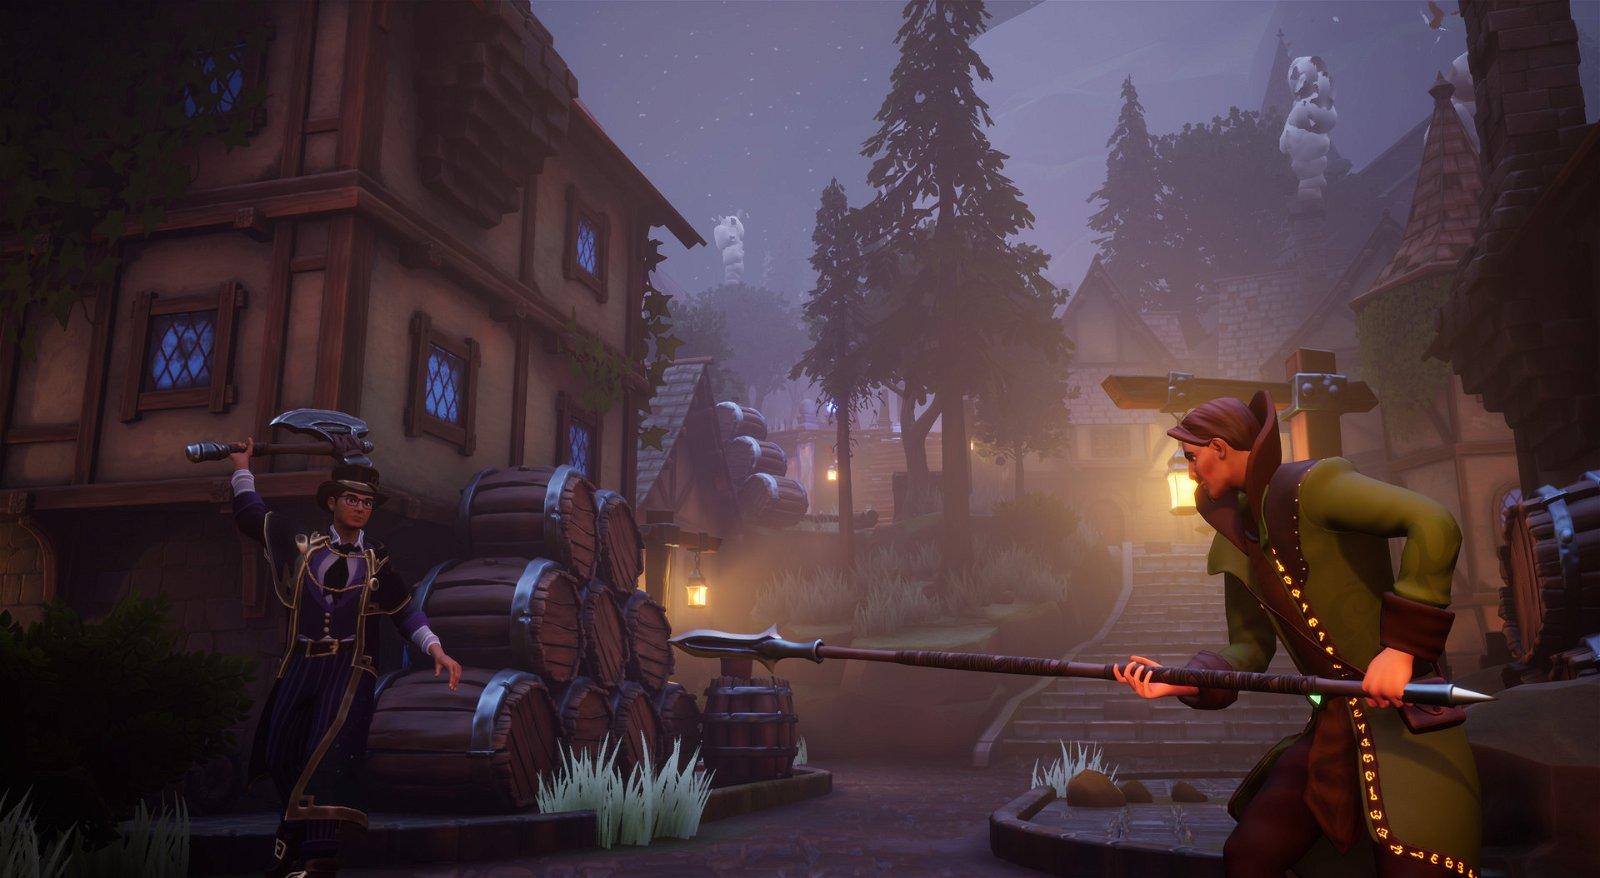 Indie Developer VestGames Announce New Social Deduction Game Eville 4